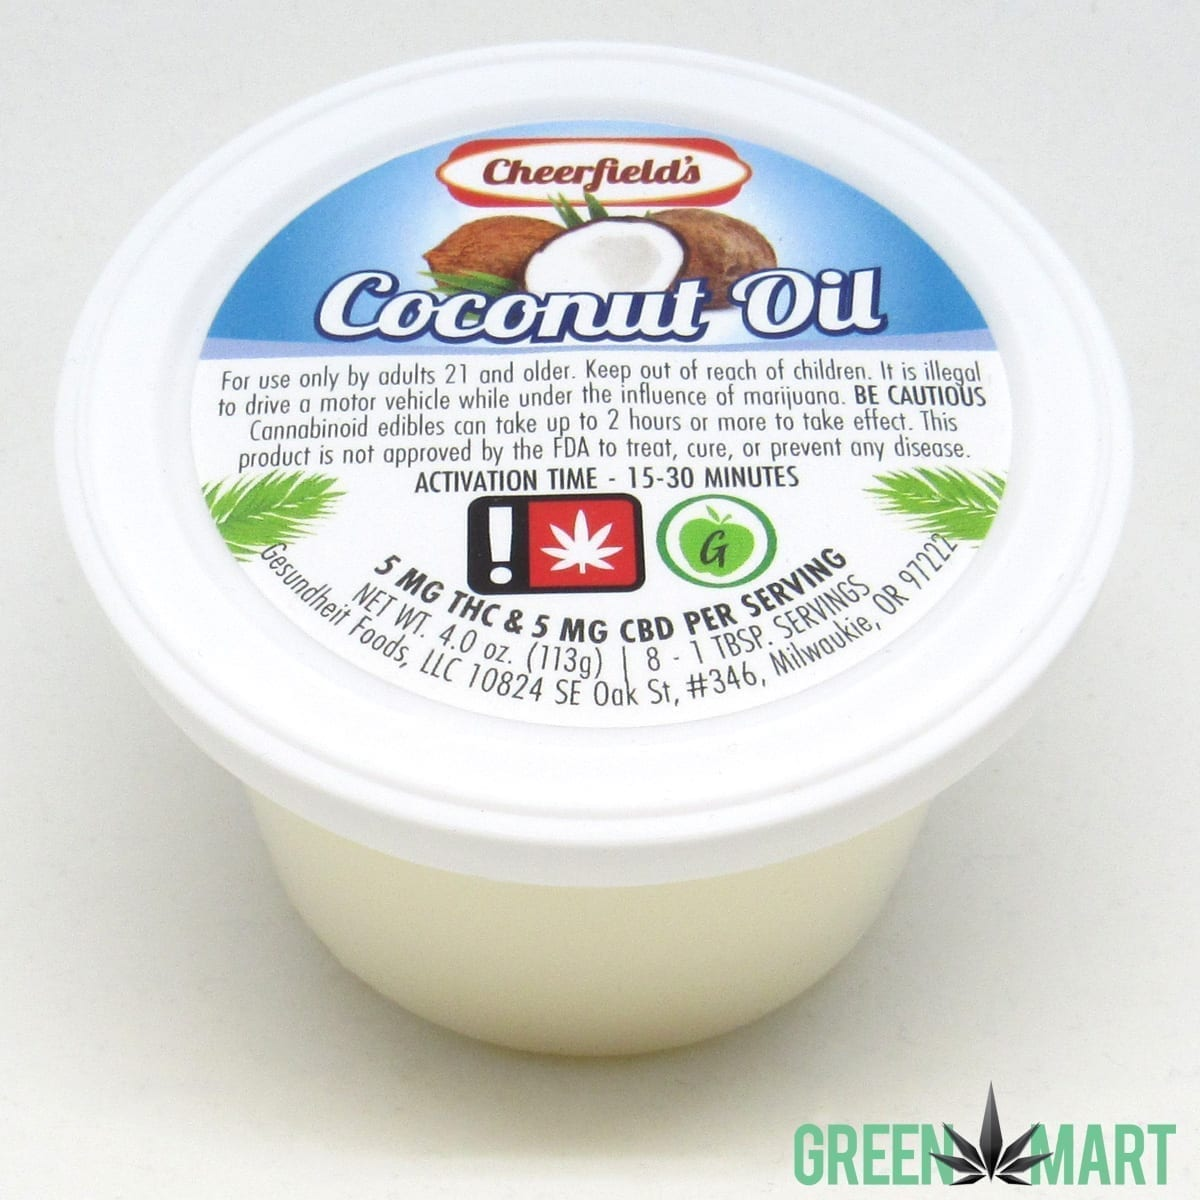 Cheerfield's Coconut Oil